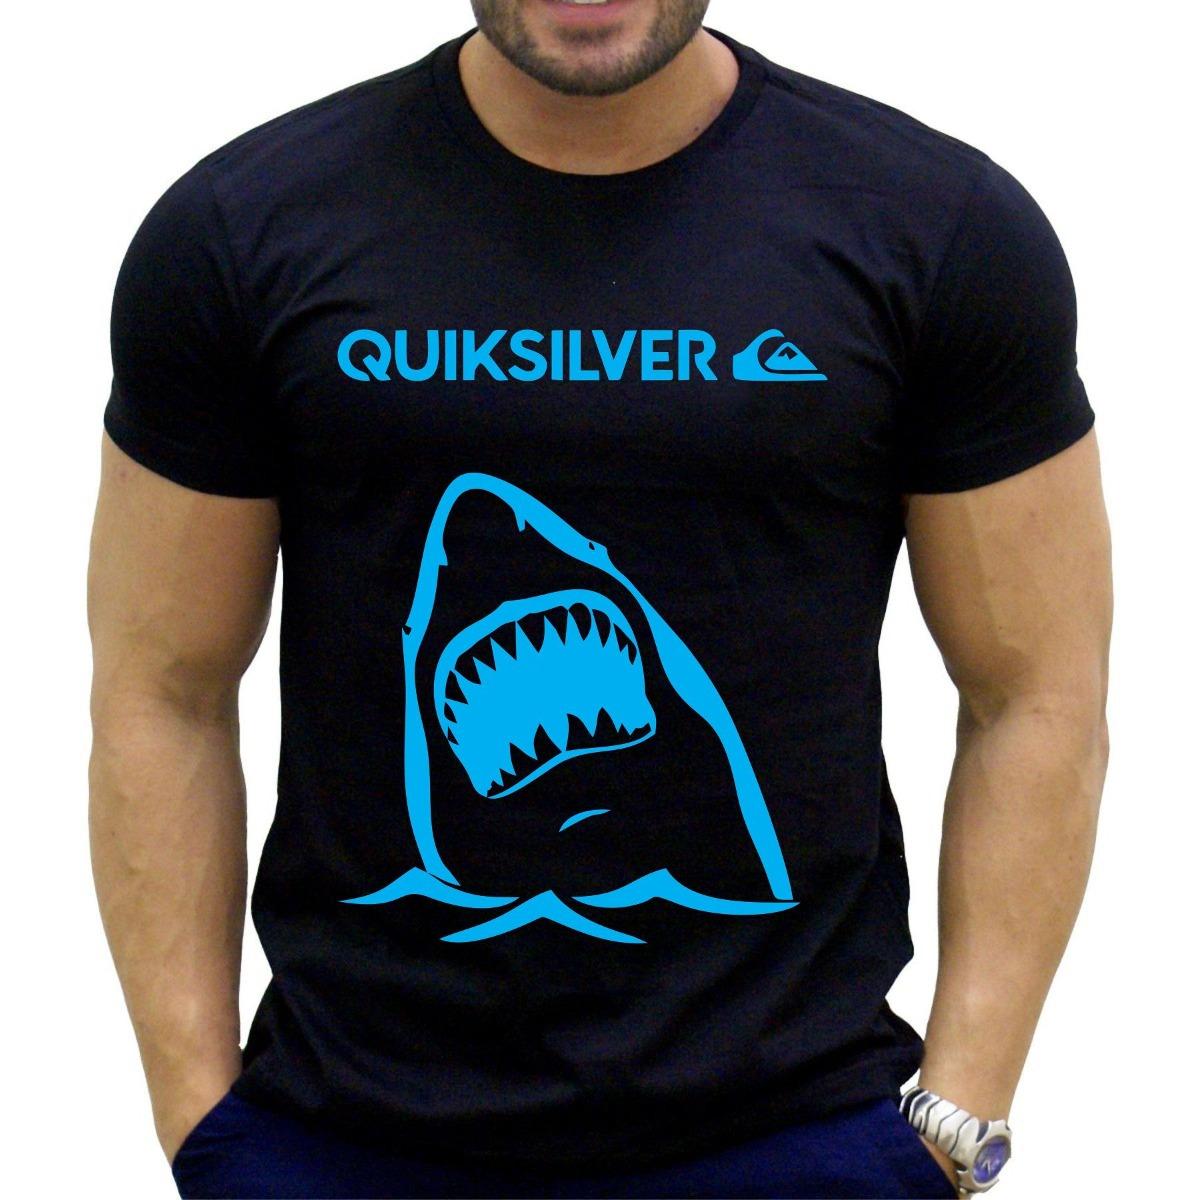 e2bbdf0f668f3 kit 10 camiseta de marca quiksilver preta azul agúa atacado. Carregando  zoom.